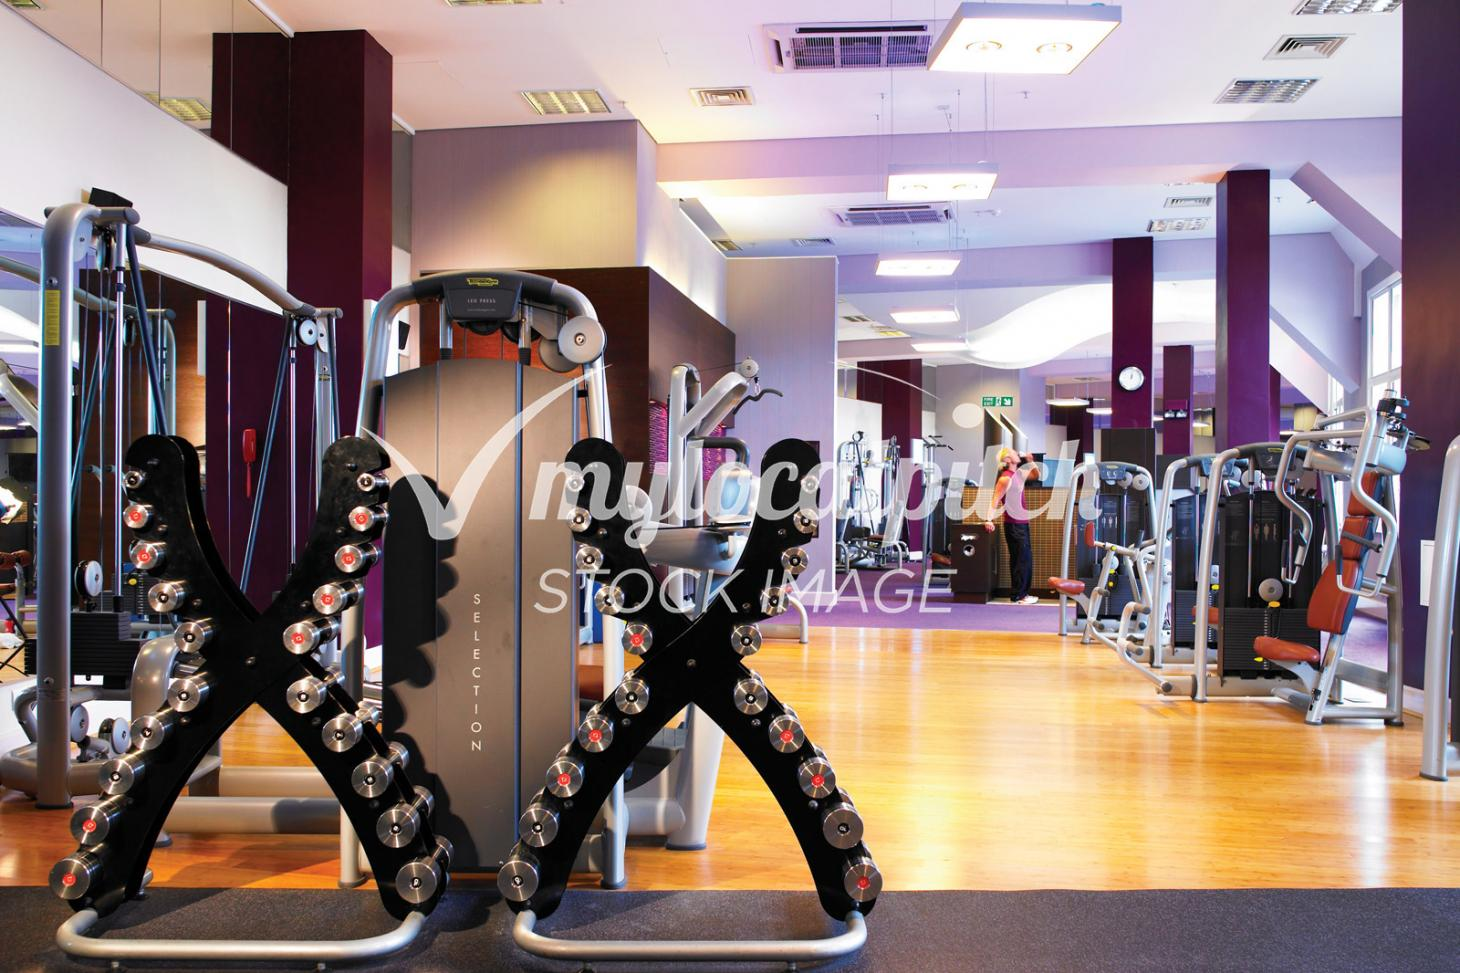 LA Fitness Holborn Gym gym